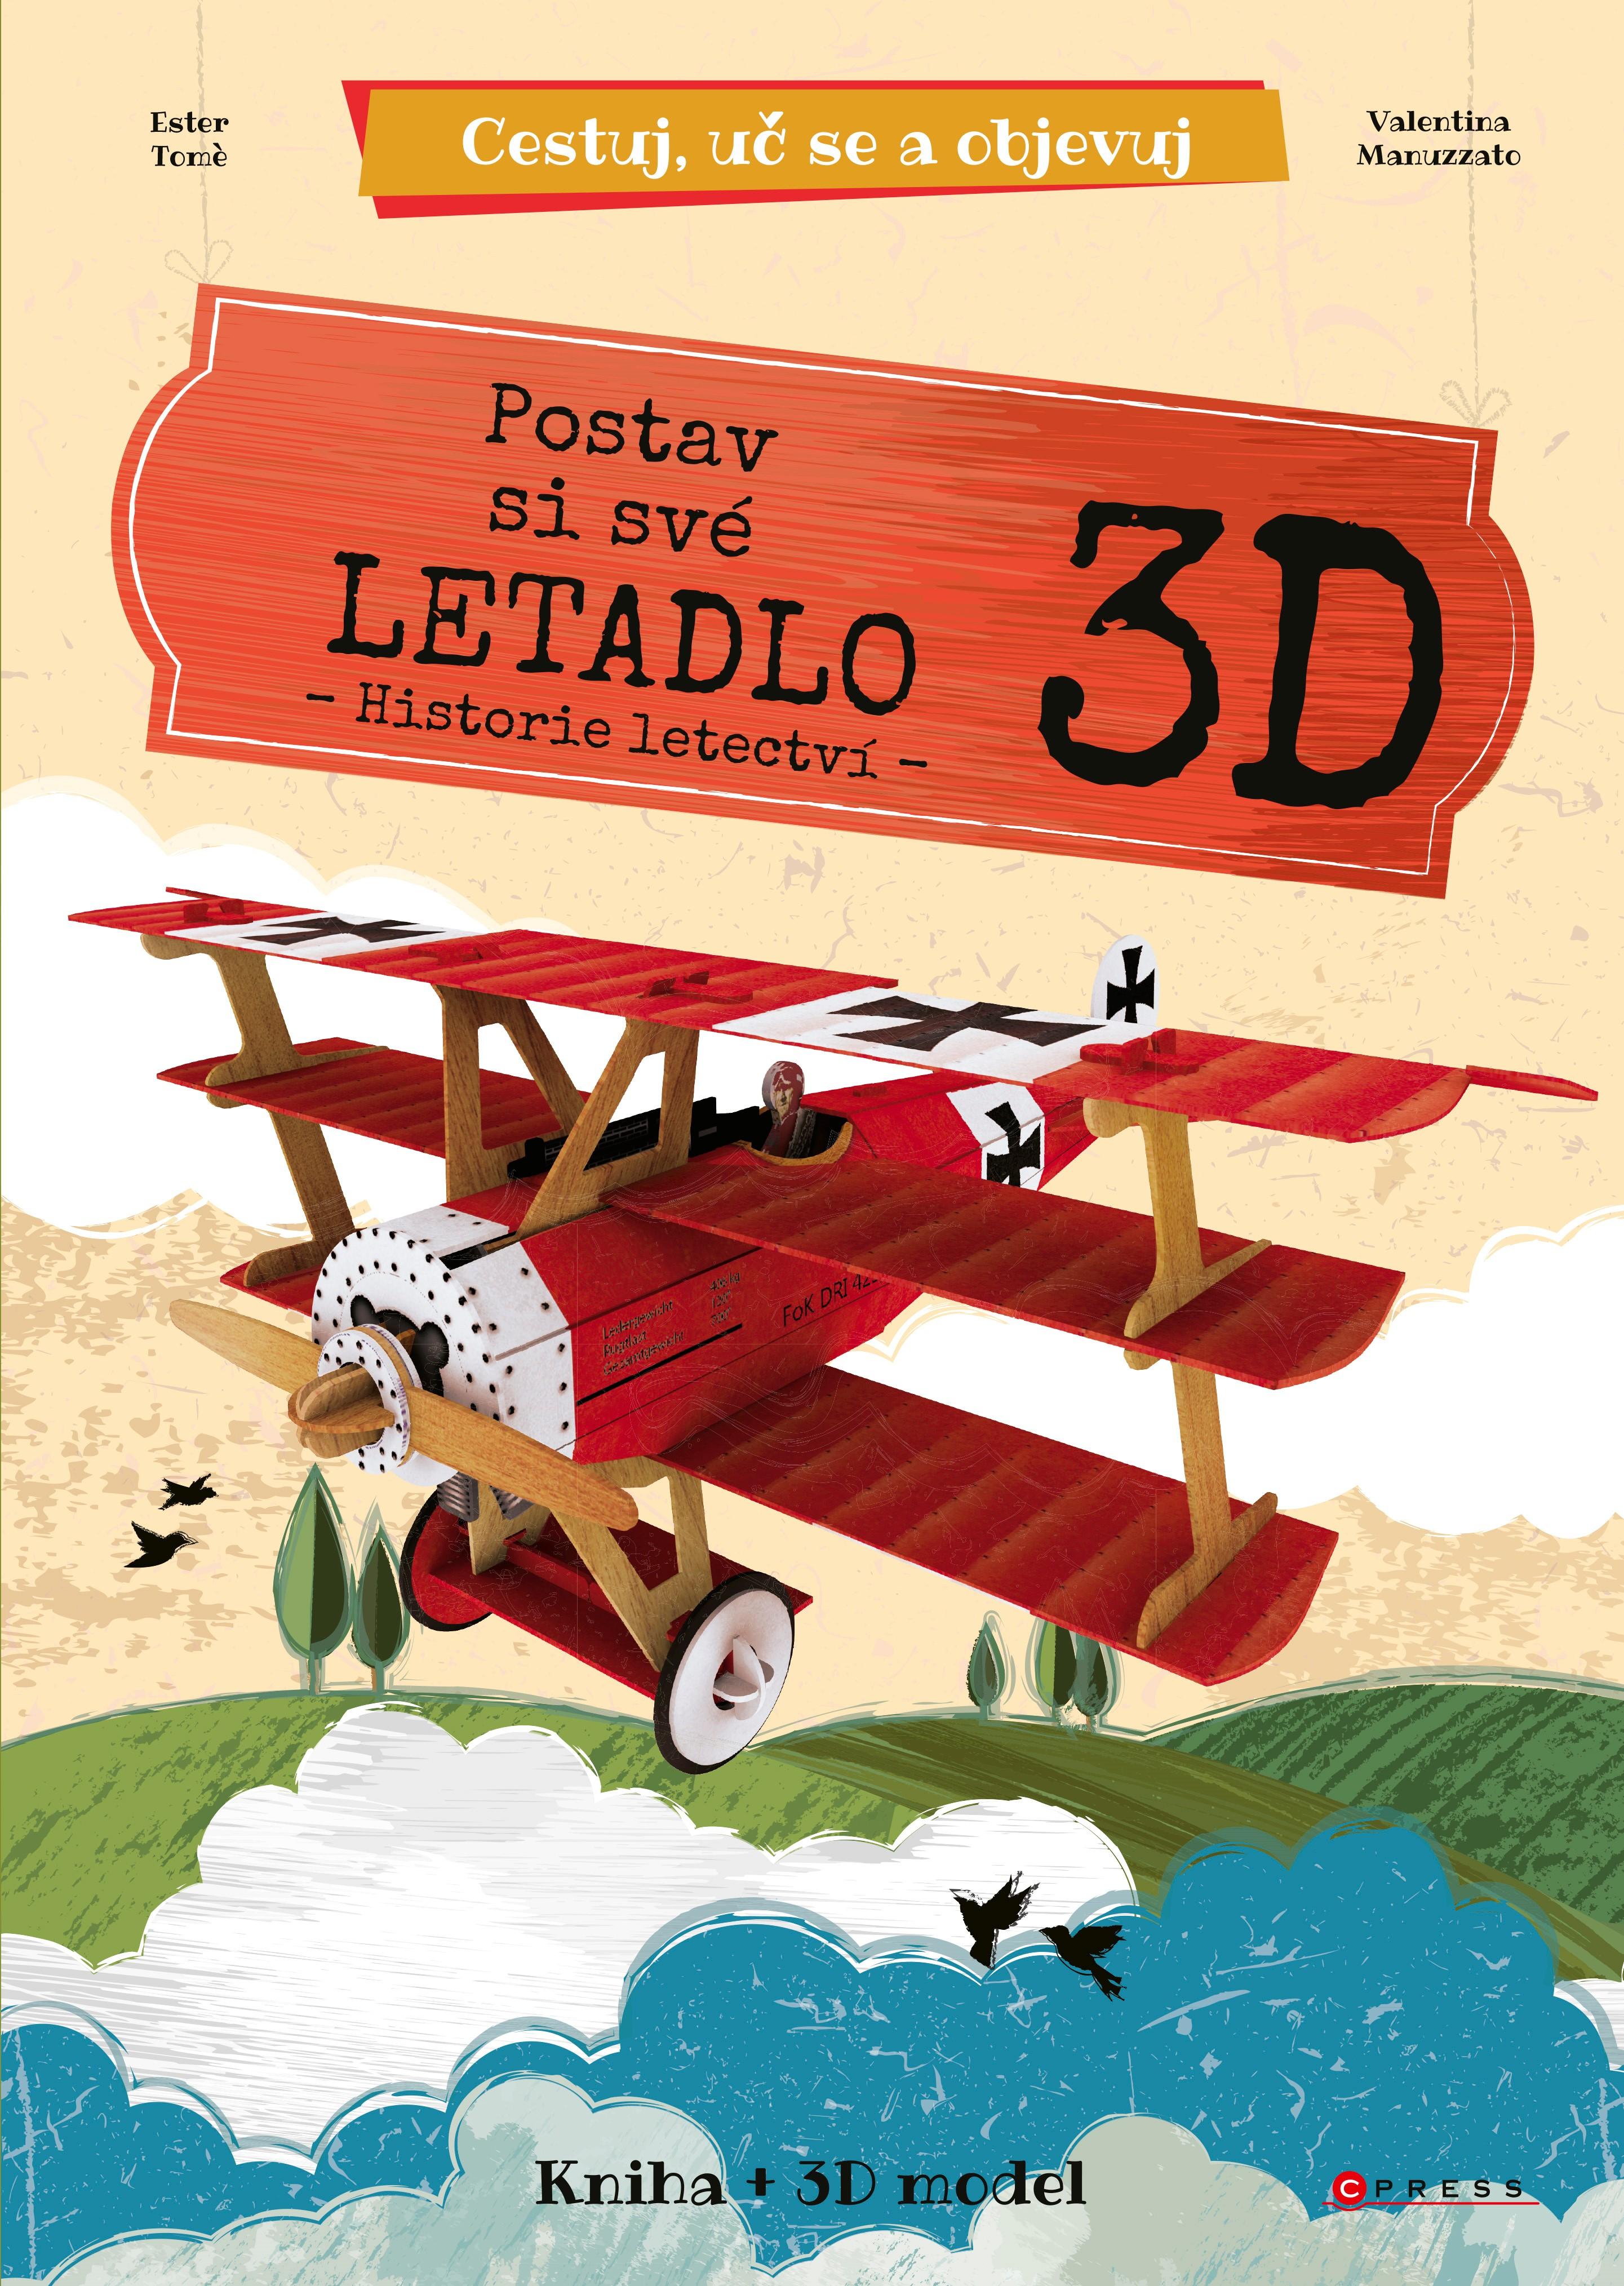 Postav si své letadlo | Ester Tome, Valentina Manuzzato